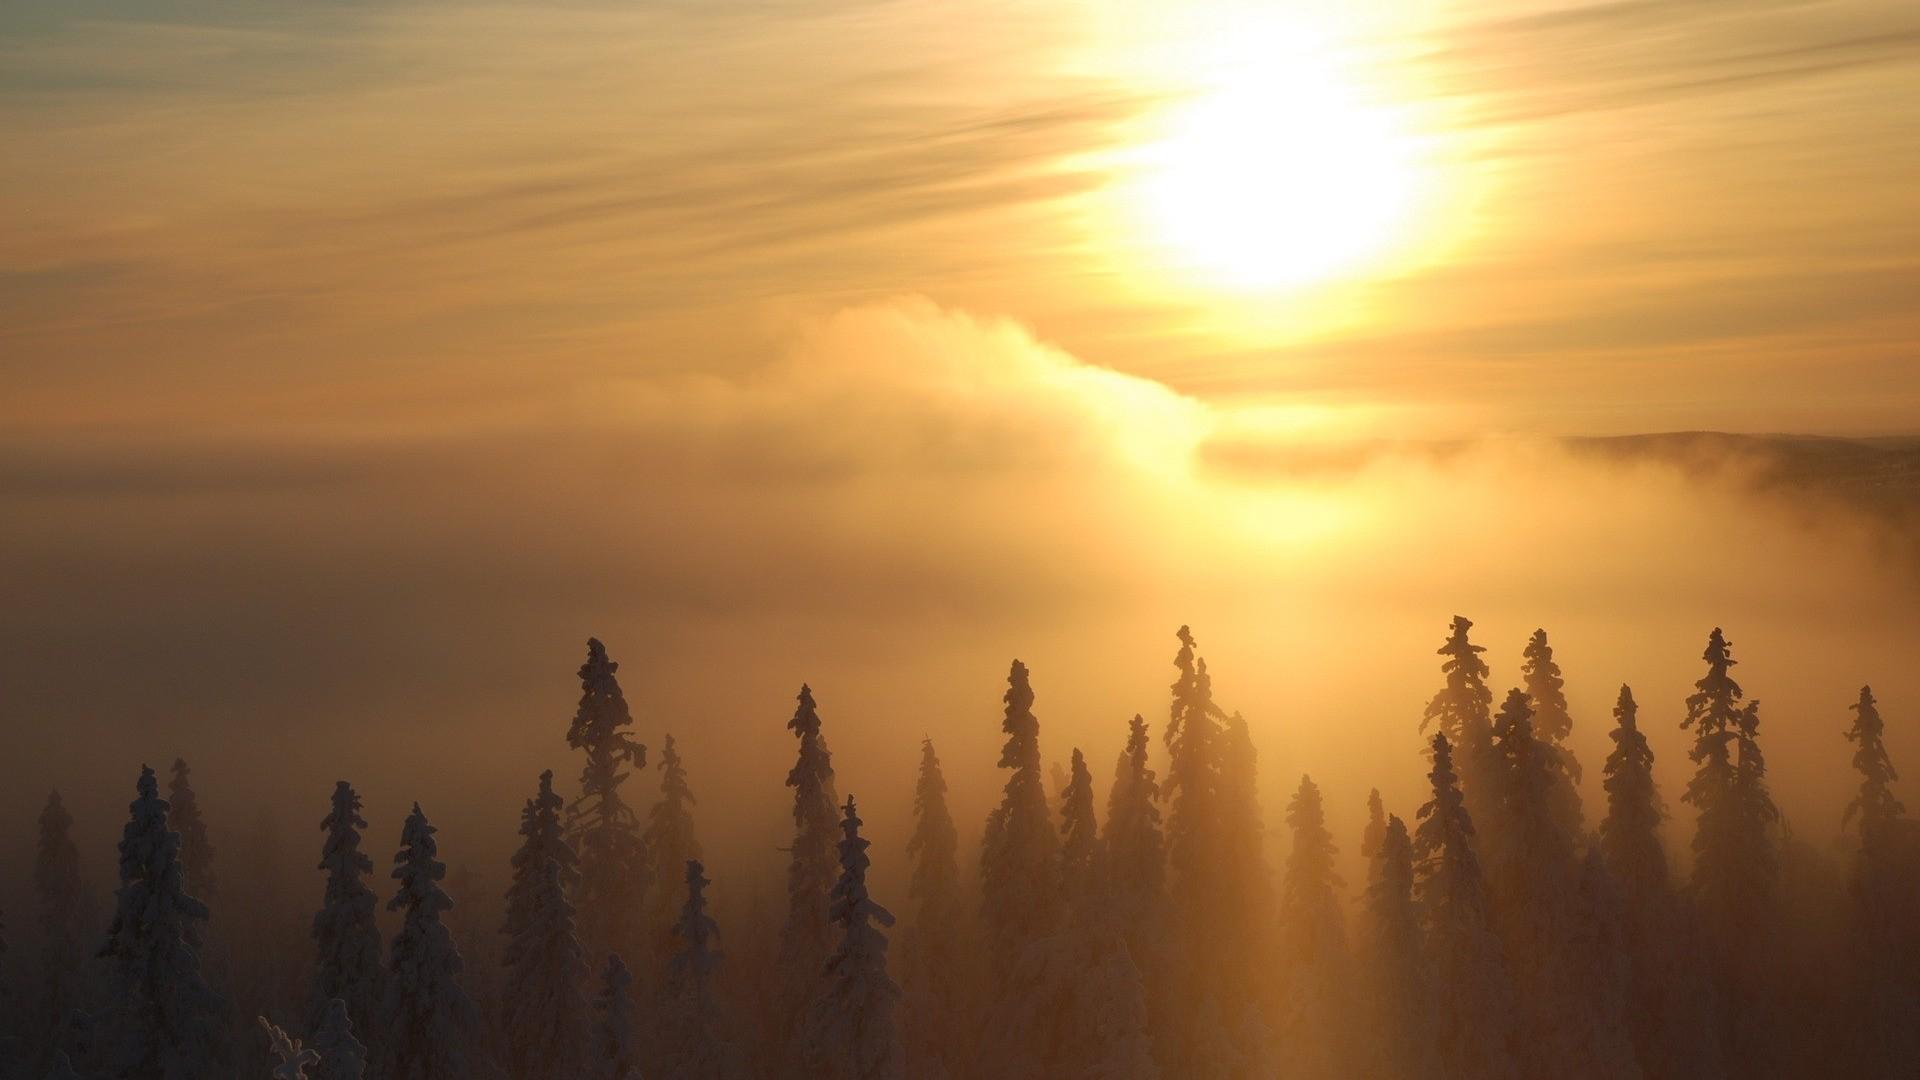 Forest Sunlight Wallpaper theme